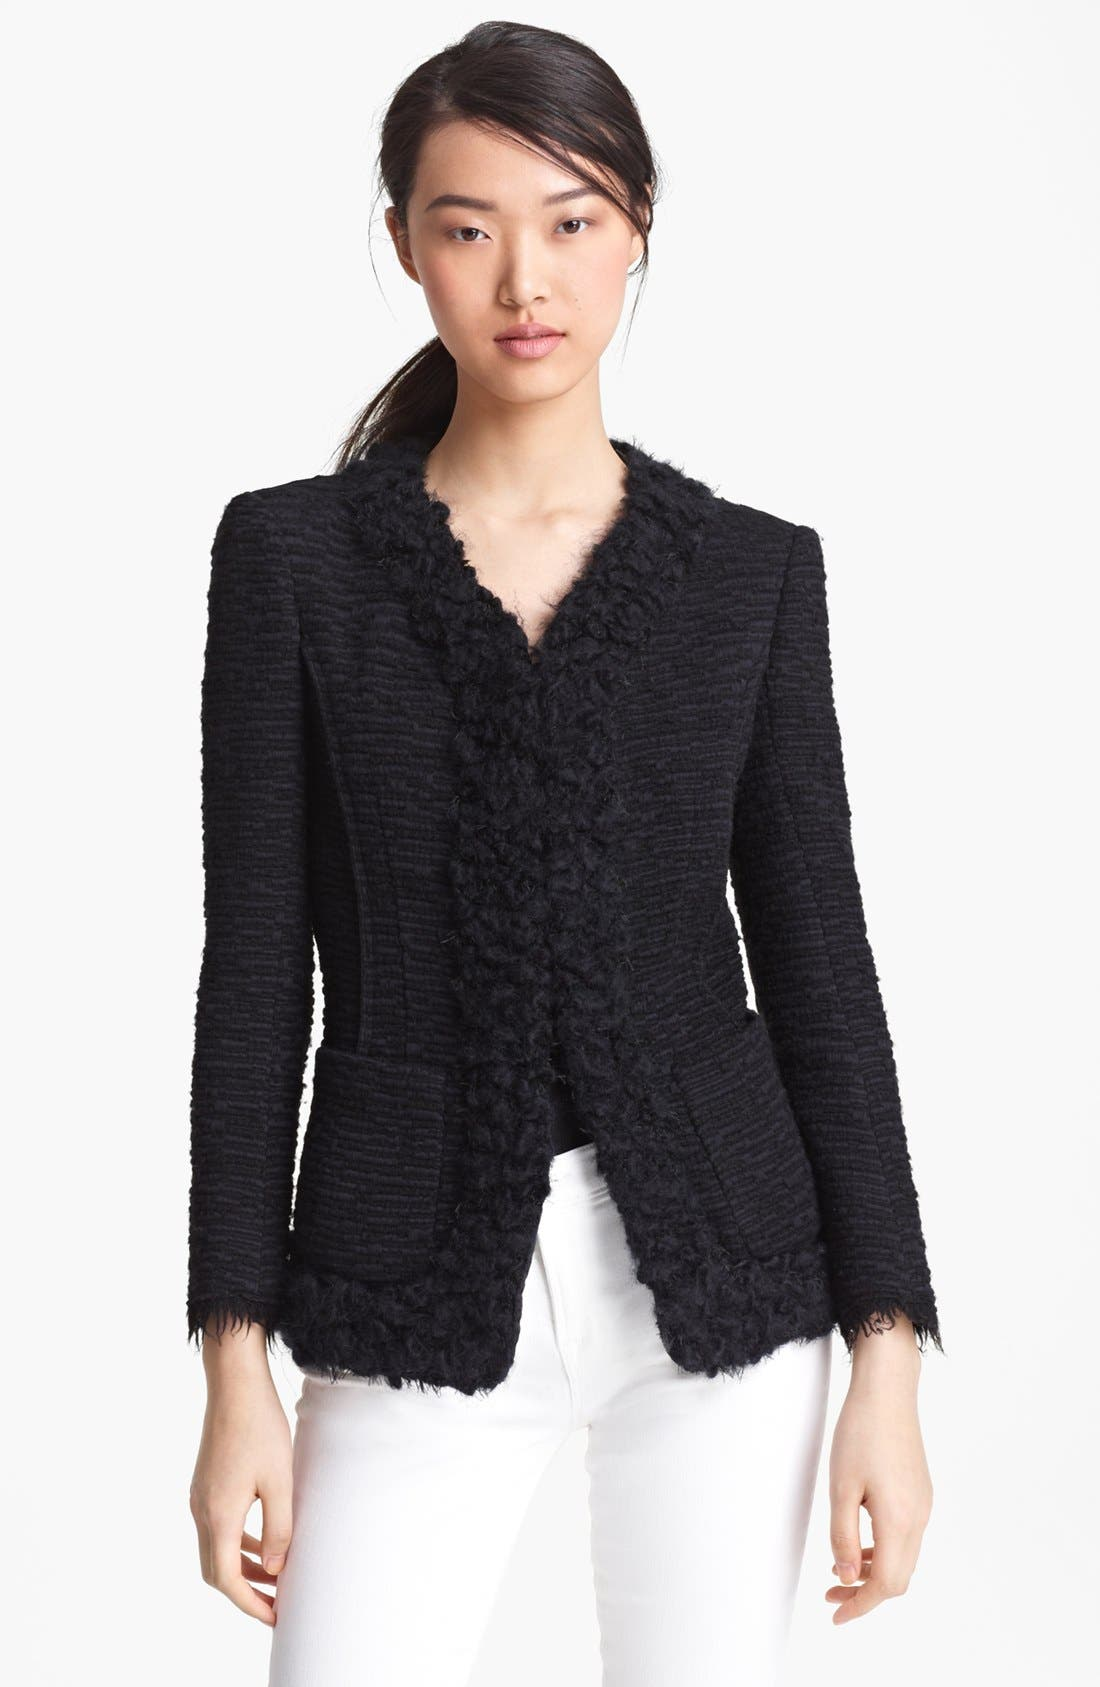 Alternate Image 1 Selected - Nina Ricci Tweed Sweater Jacket